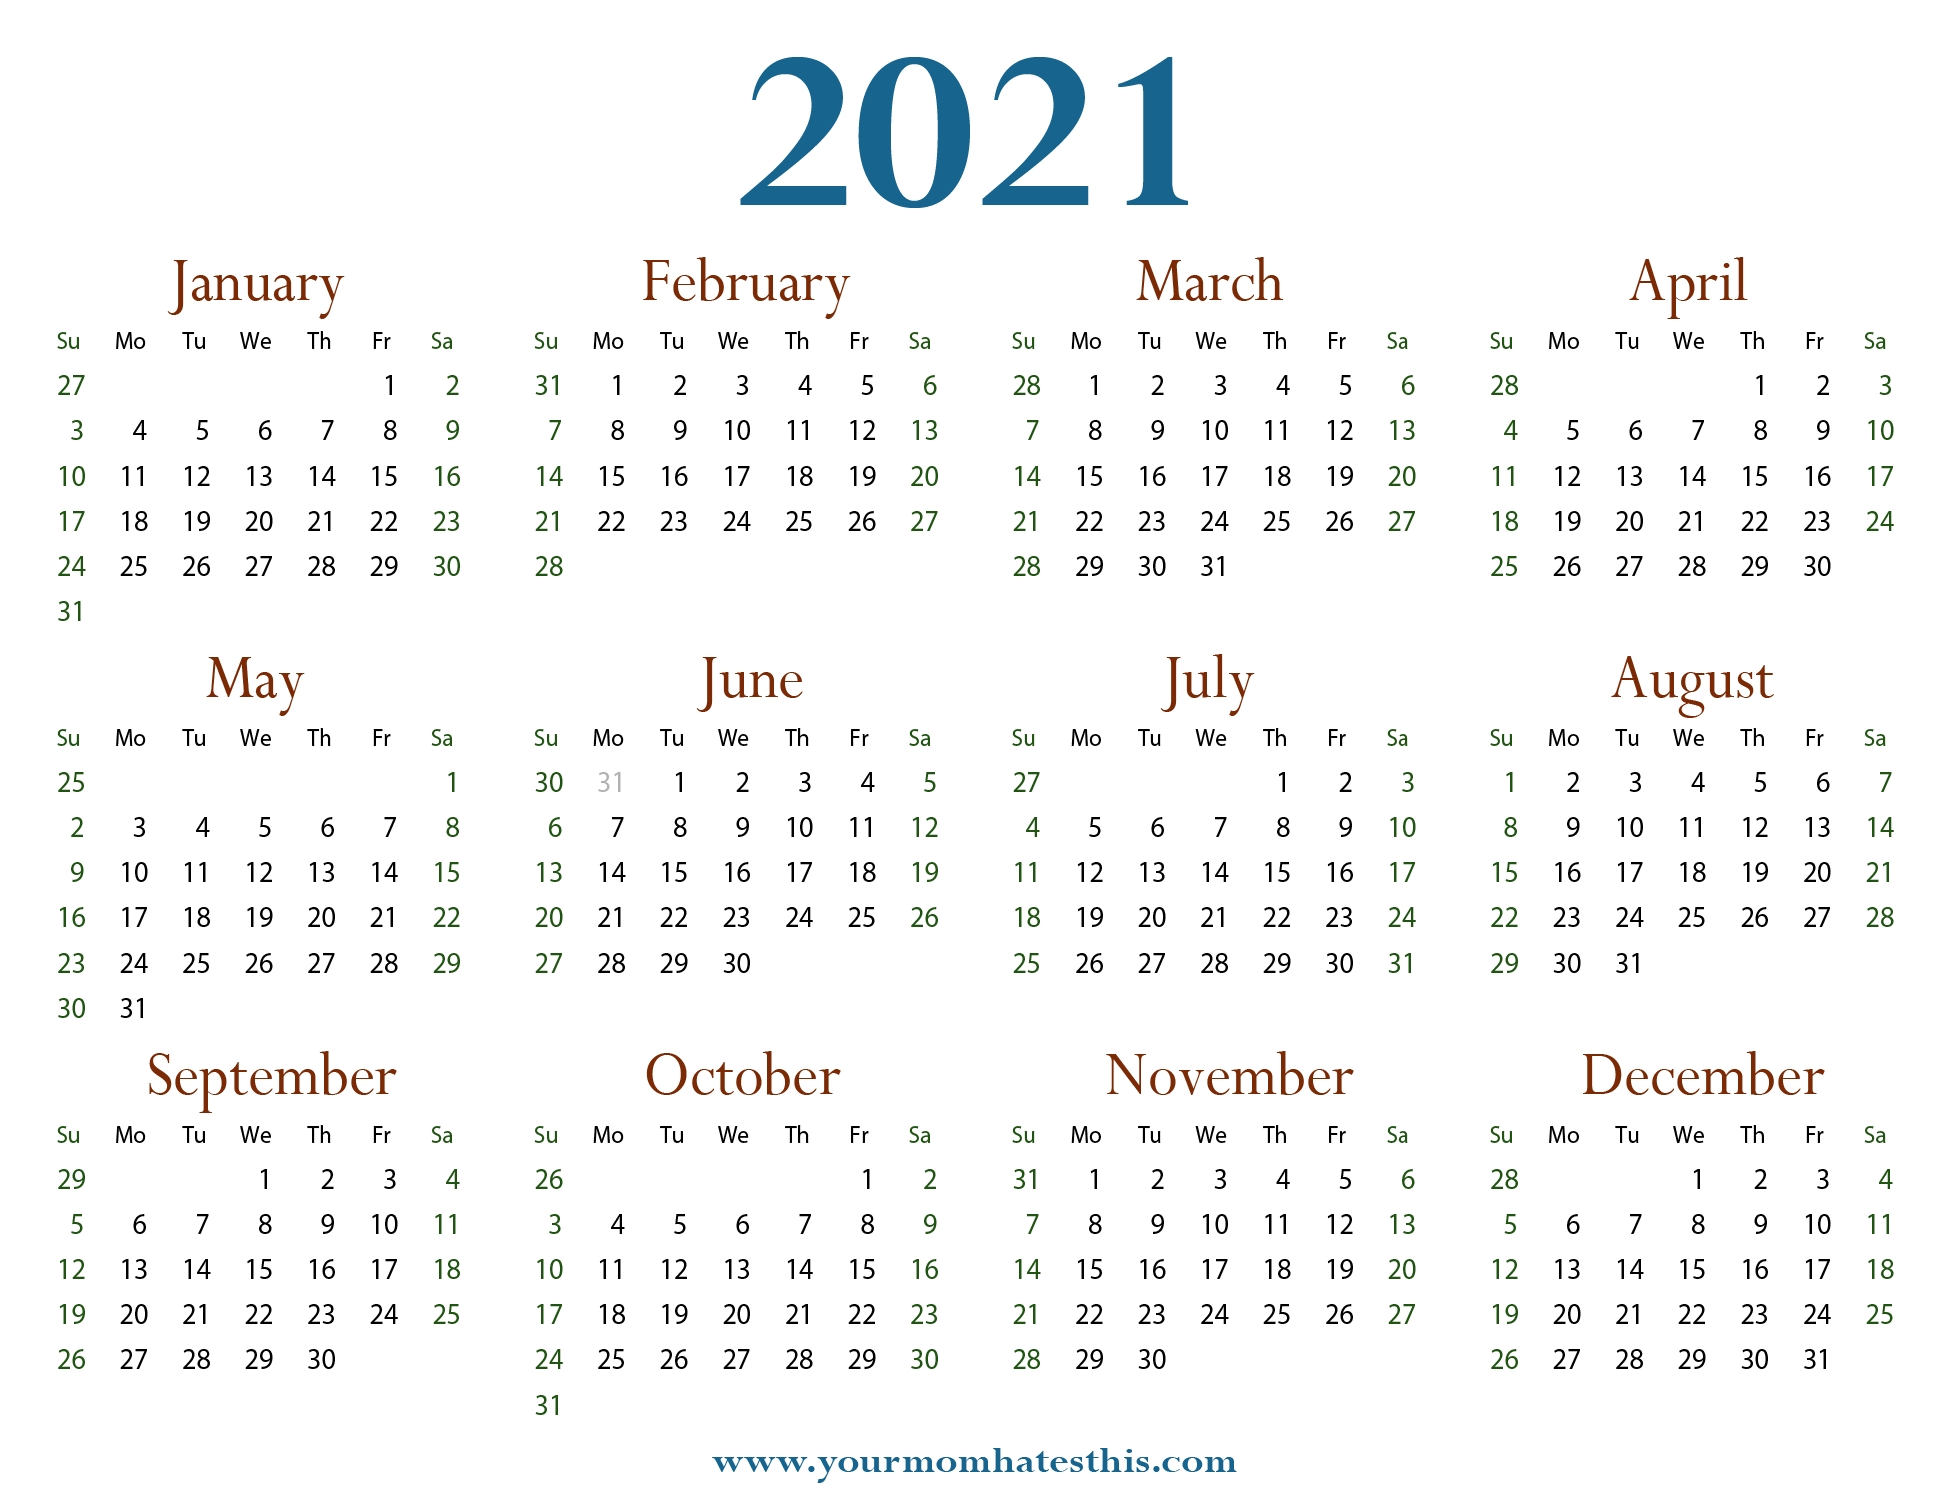 Download 2021 Calendars & Pdf Templates in Yrdsb Calendar 2019 2021